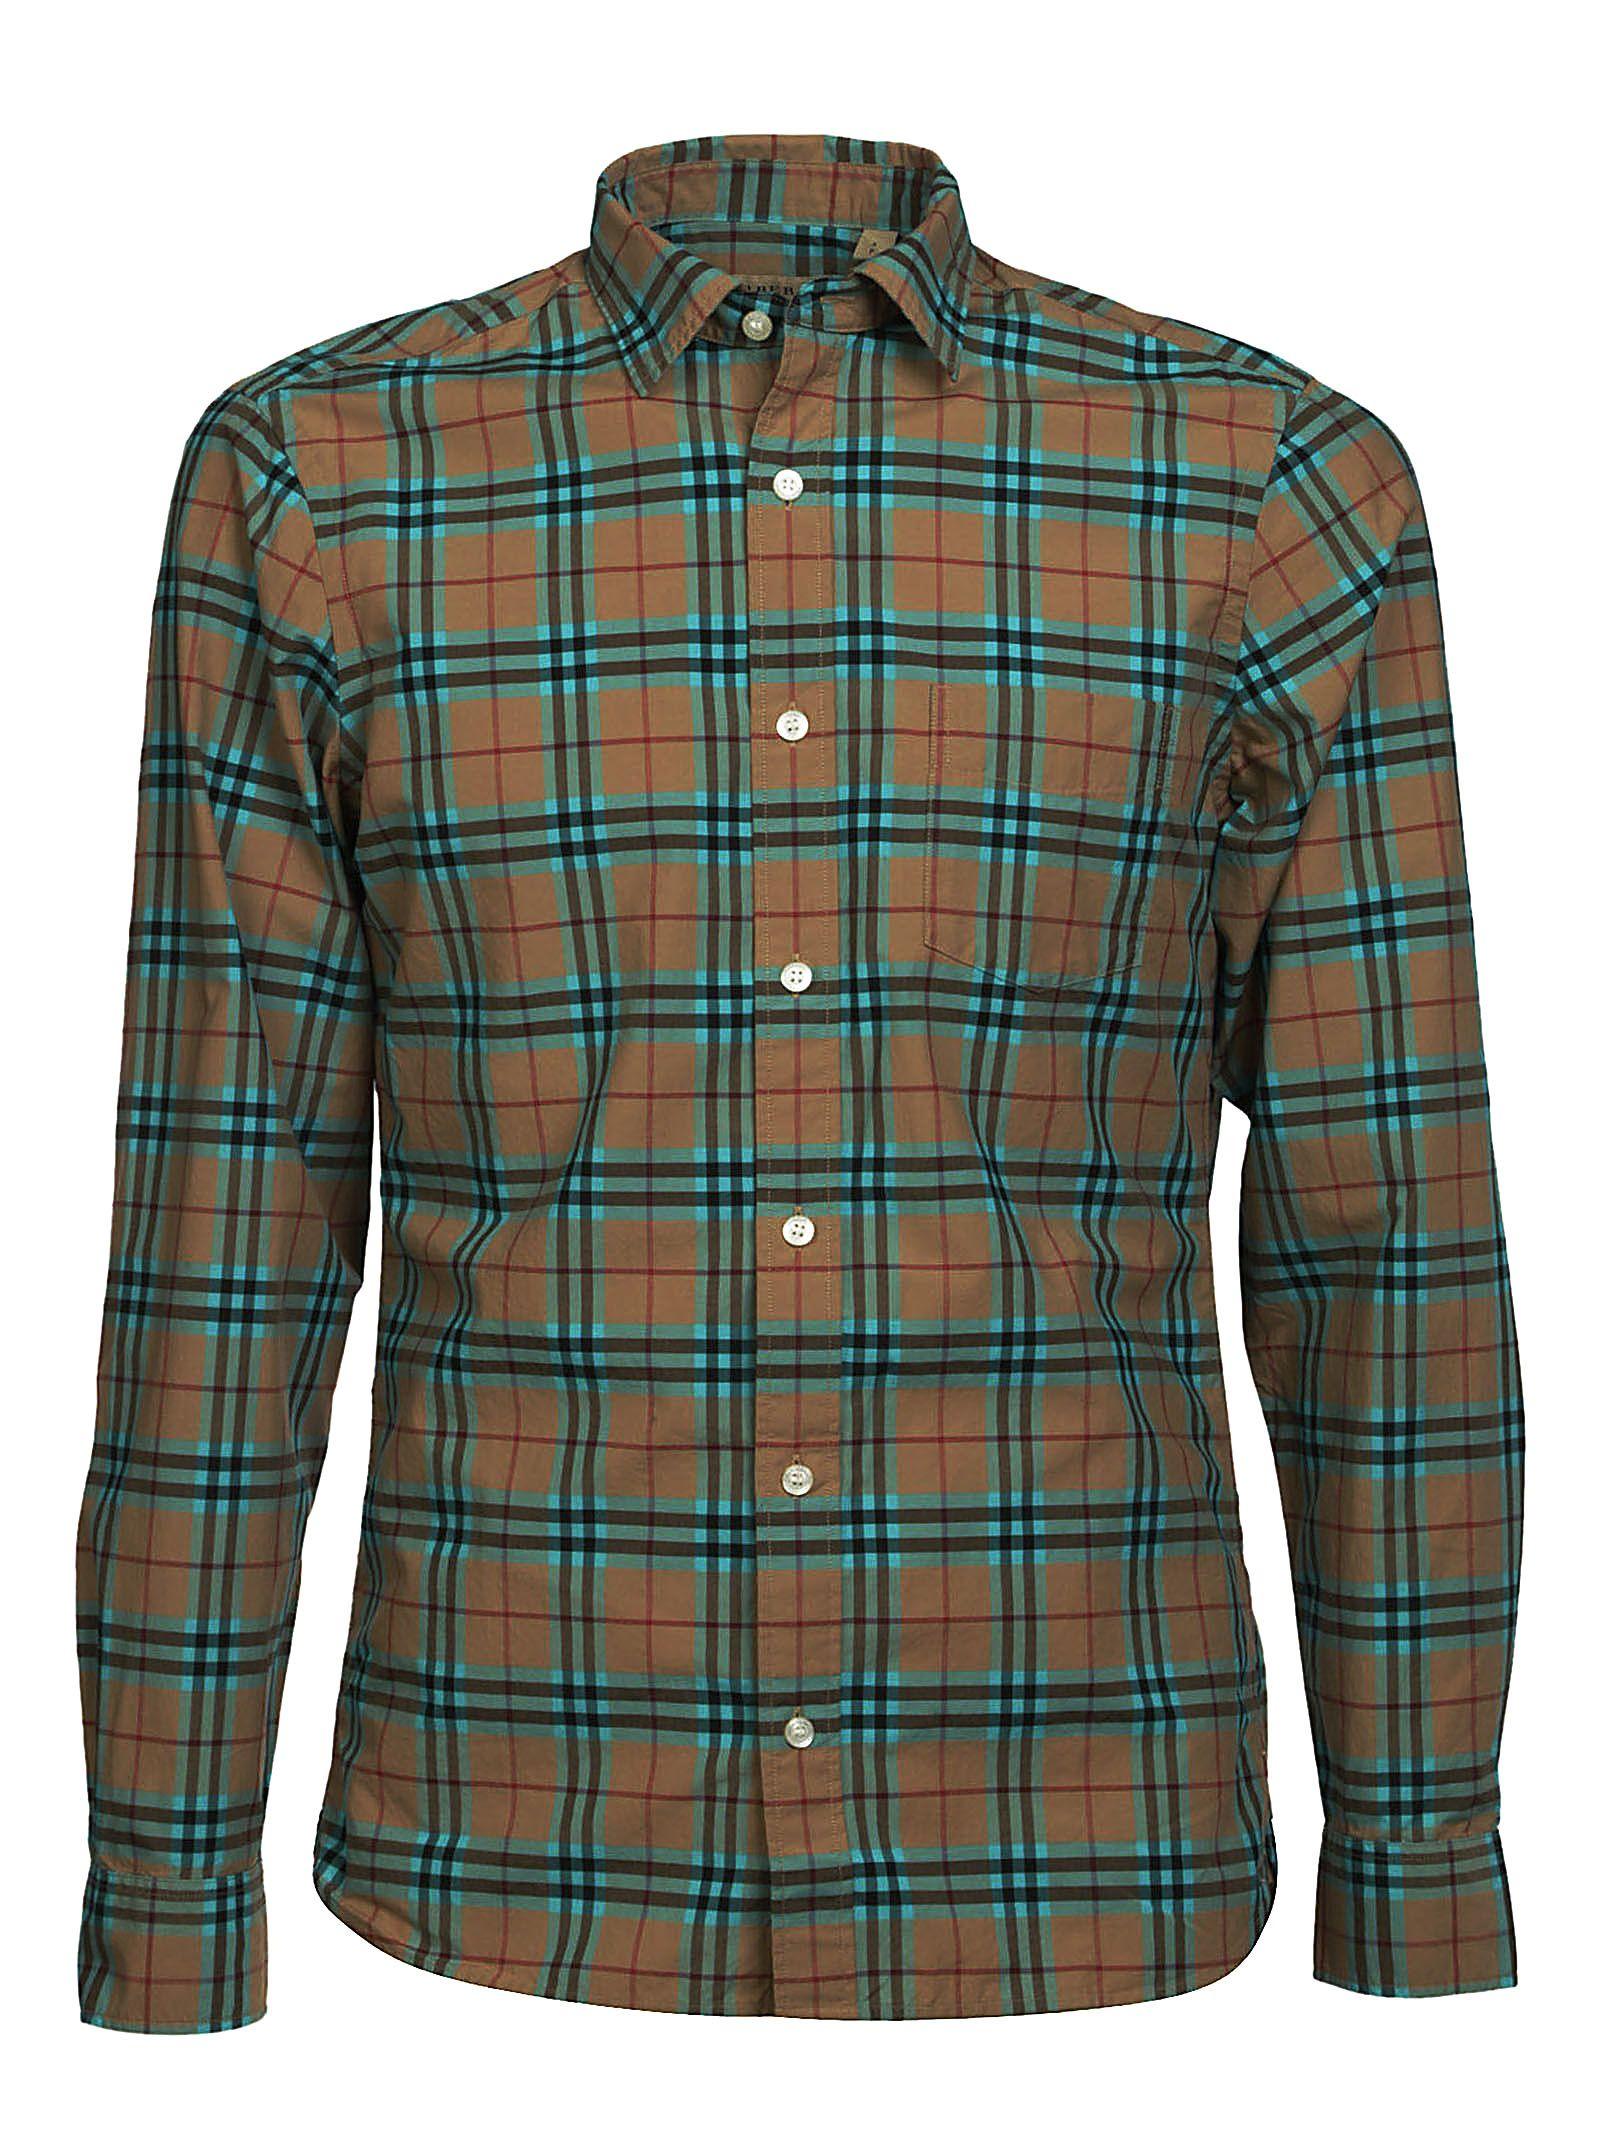 539d2323 Burberry Burberry Checked Shirt - Azure - 10578771 | italist